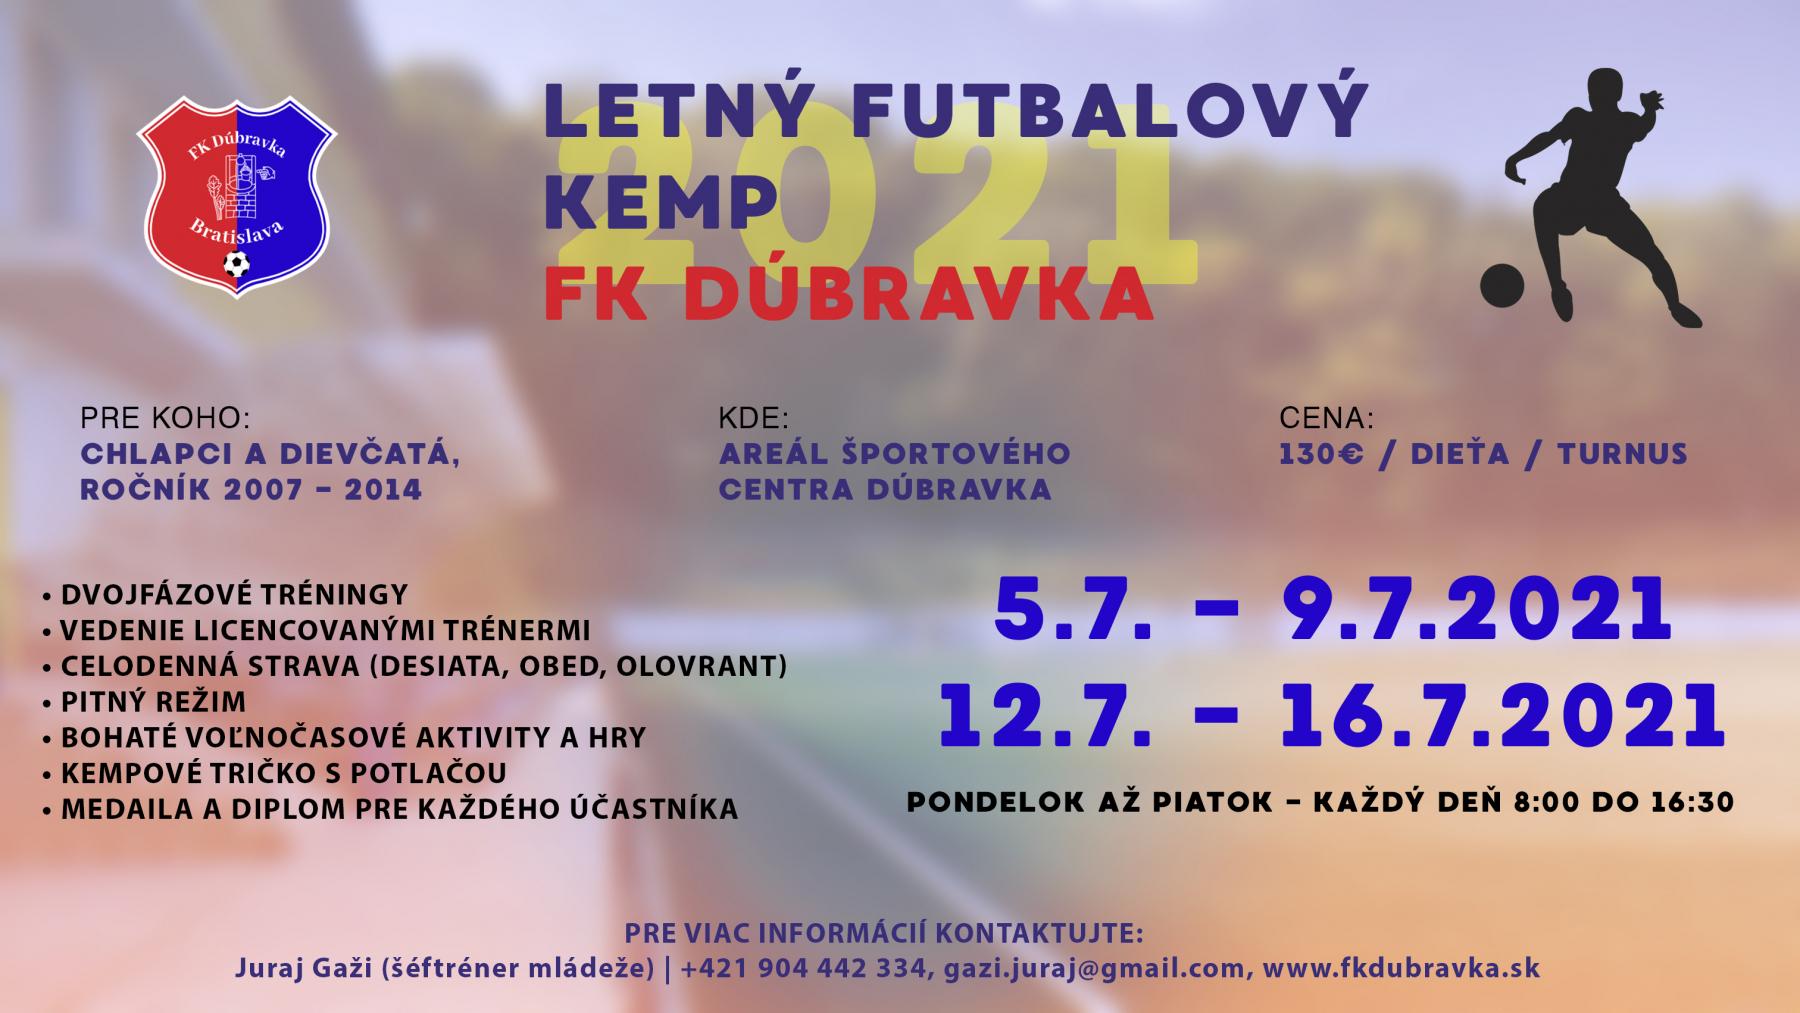 letny-futbalovy-kemp-2021-DTV